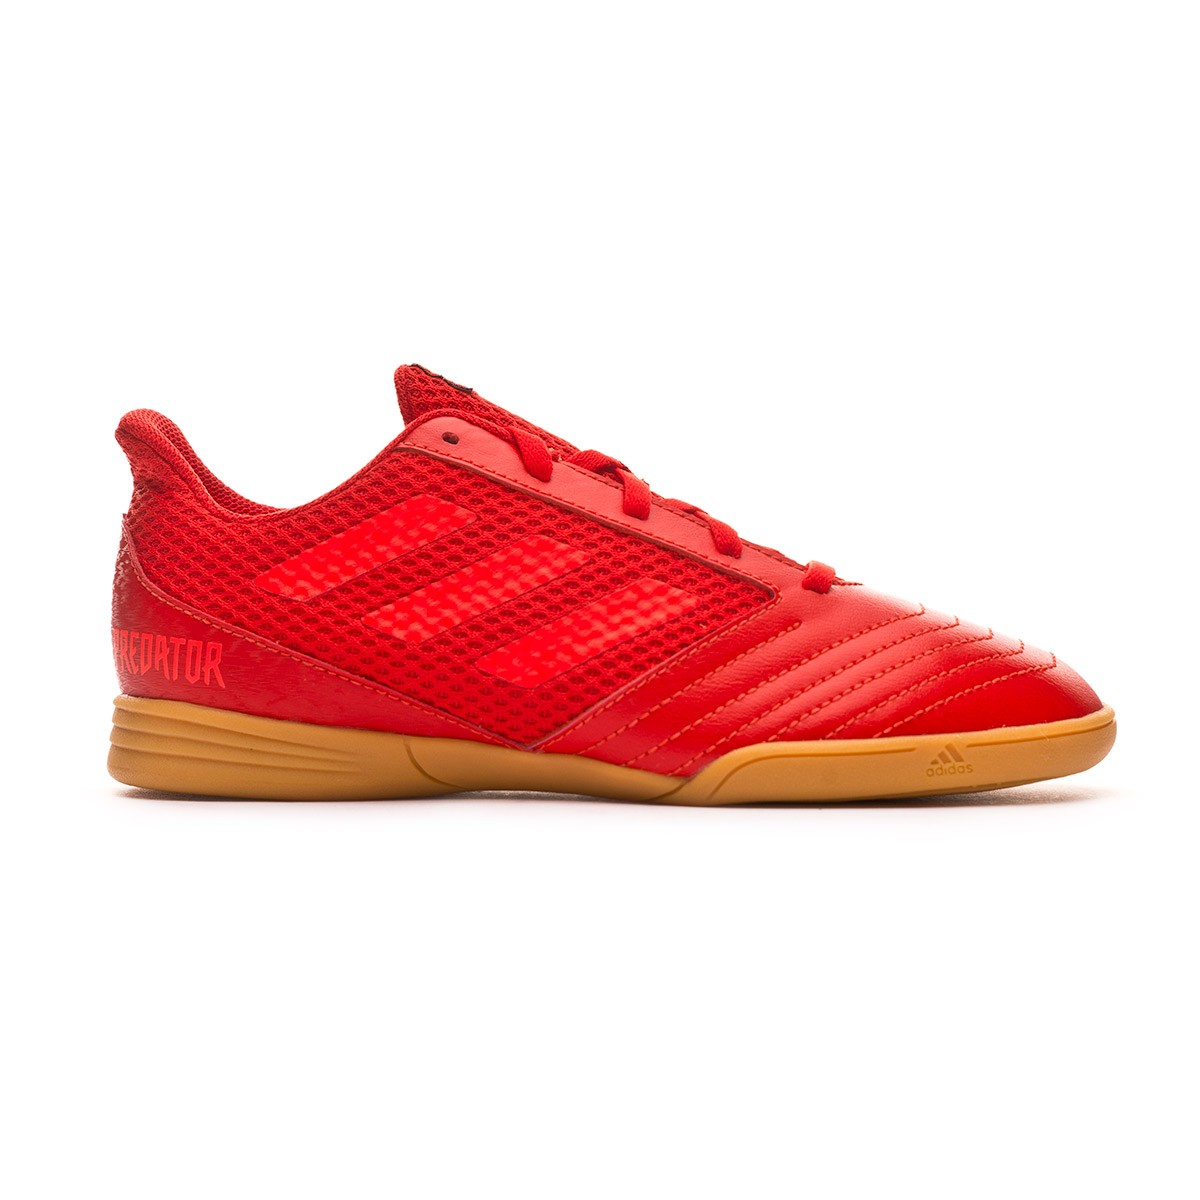 53cb61ad90033 Sapatilha de Futsal adidas Predator Tango 19.4 IN Sala Crianças Active  red-Solar red-Core black - Loja de futebol Fútbol Emotion